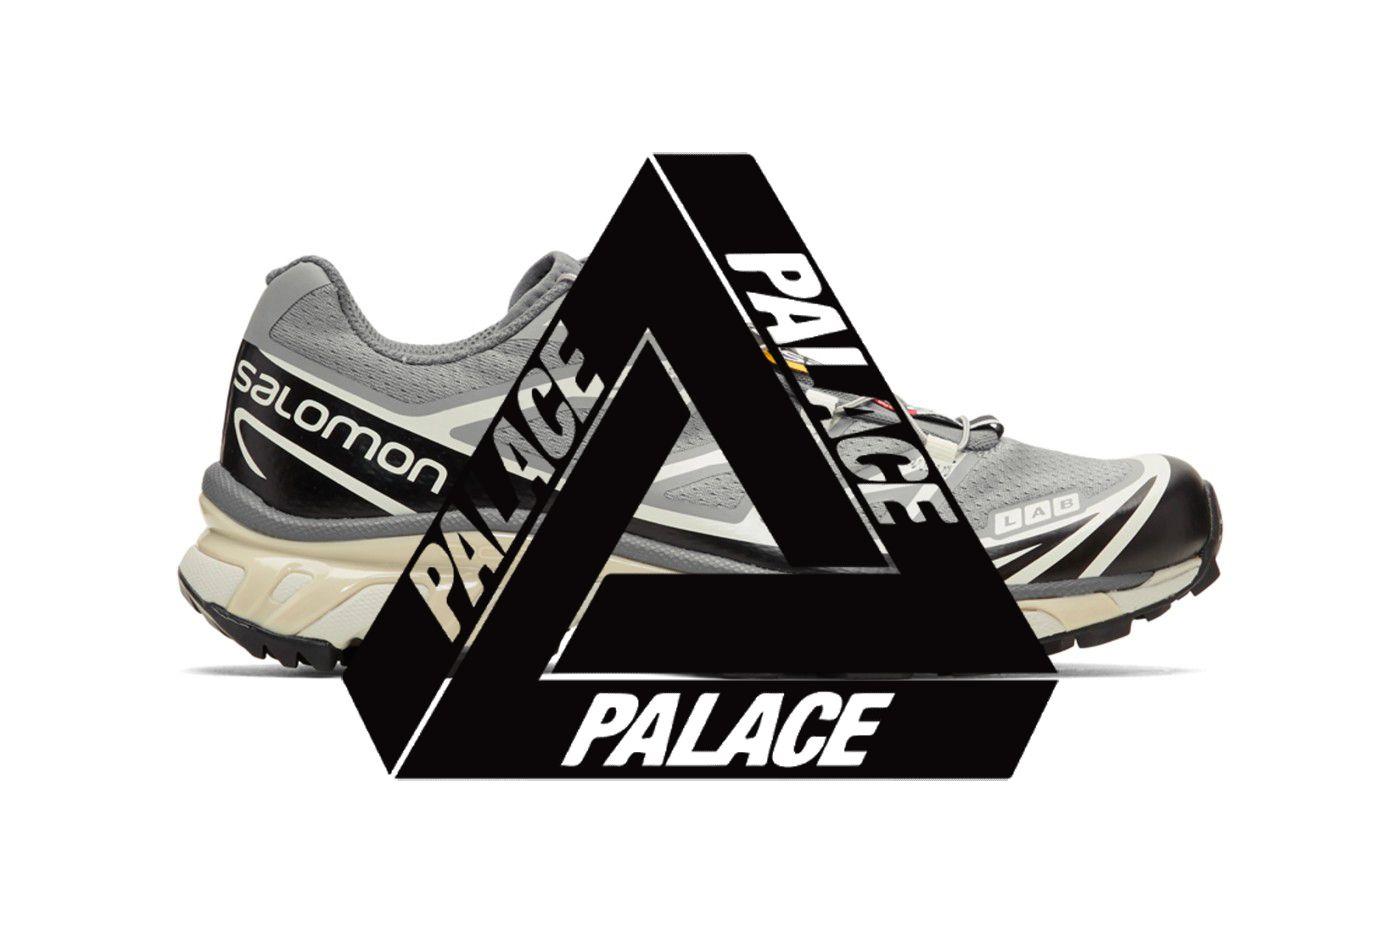 Palace Salomon